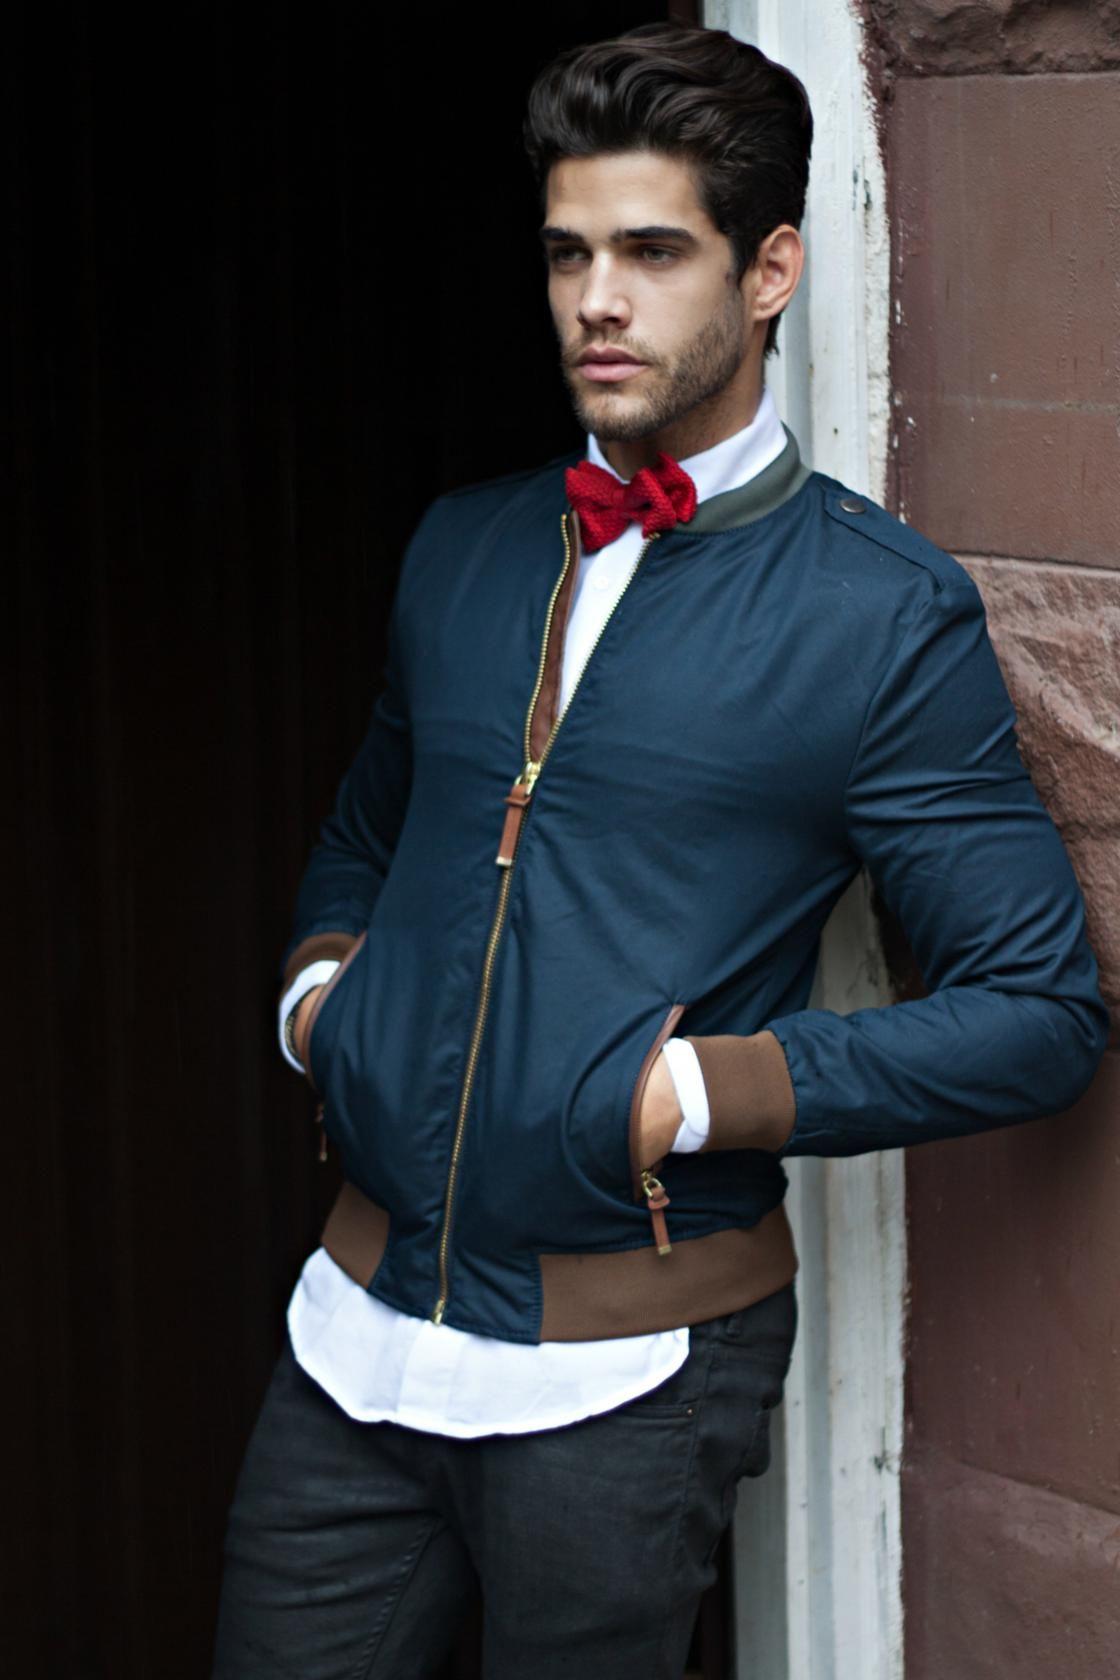 Landon Falgoust by Seth London. Follow my board #LesBeauxHabits for the best of men fashion: http://pinterest.com/chafernandez/les-beaux-habits/